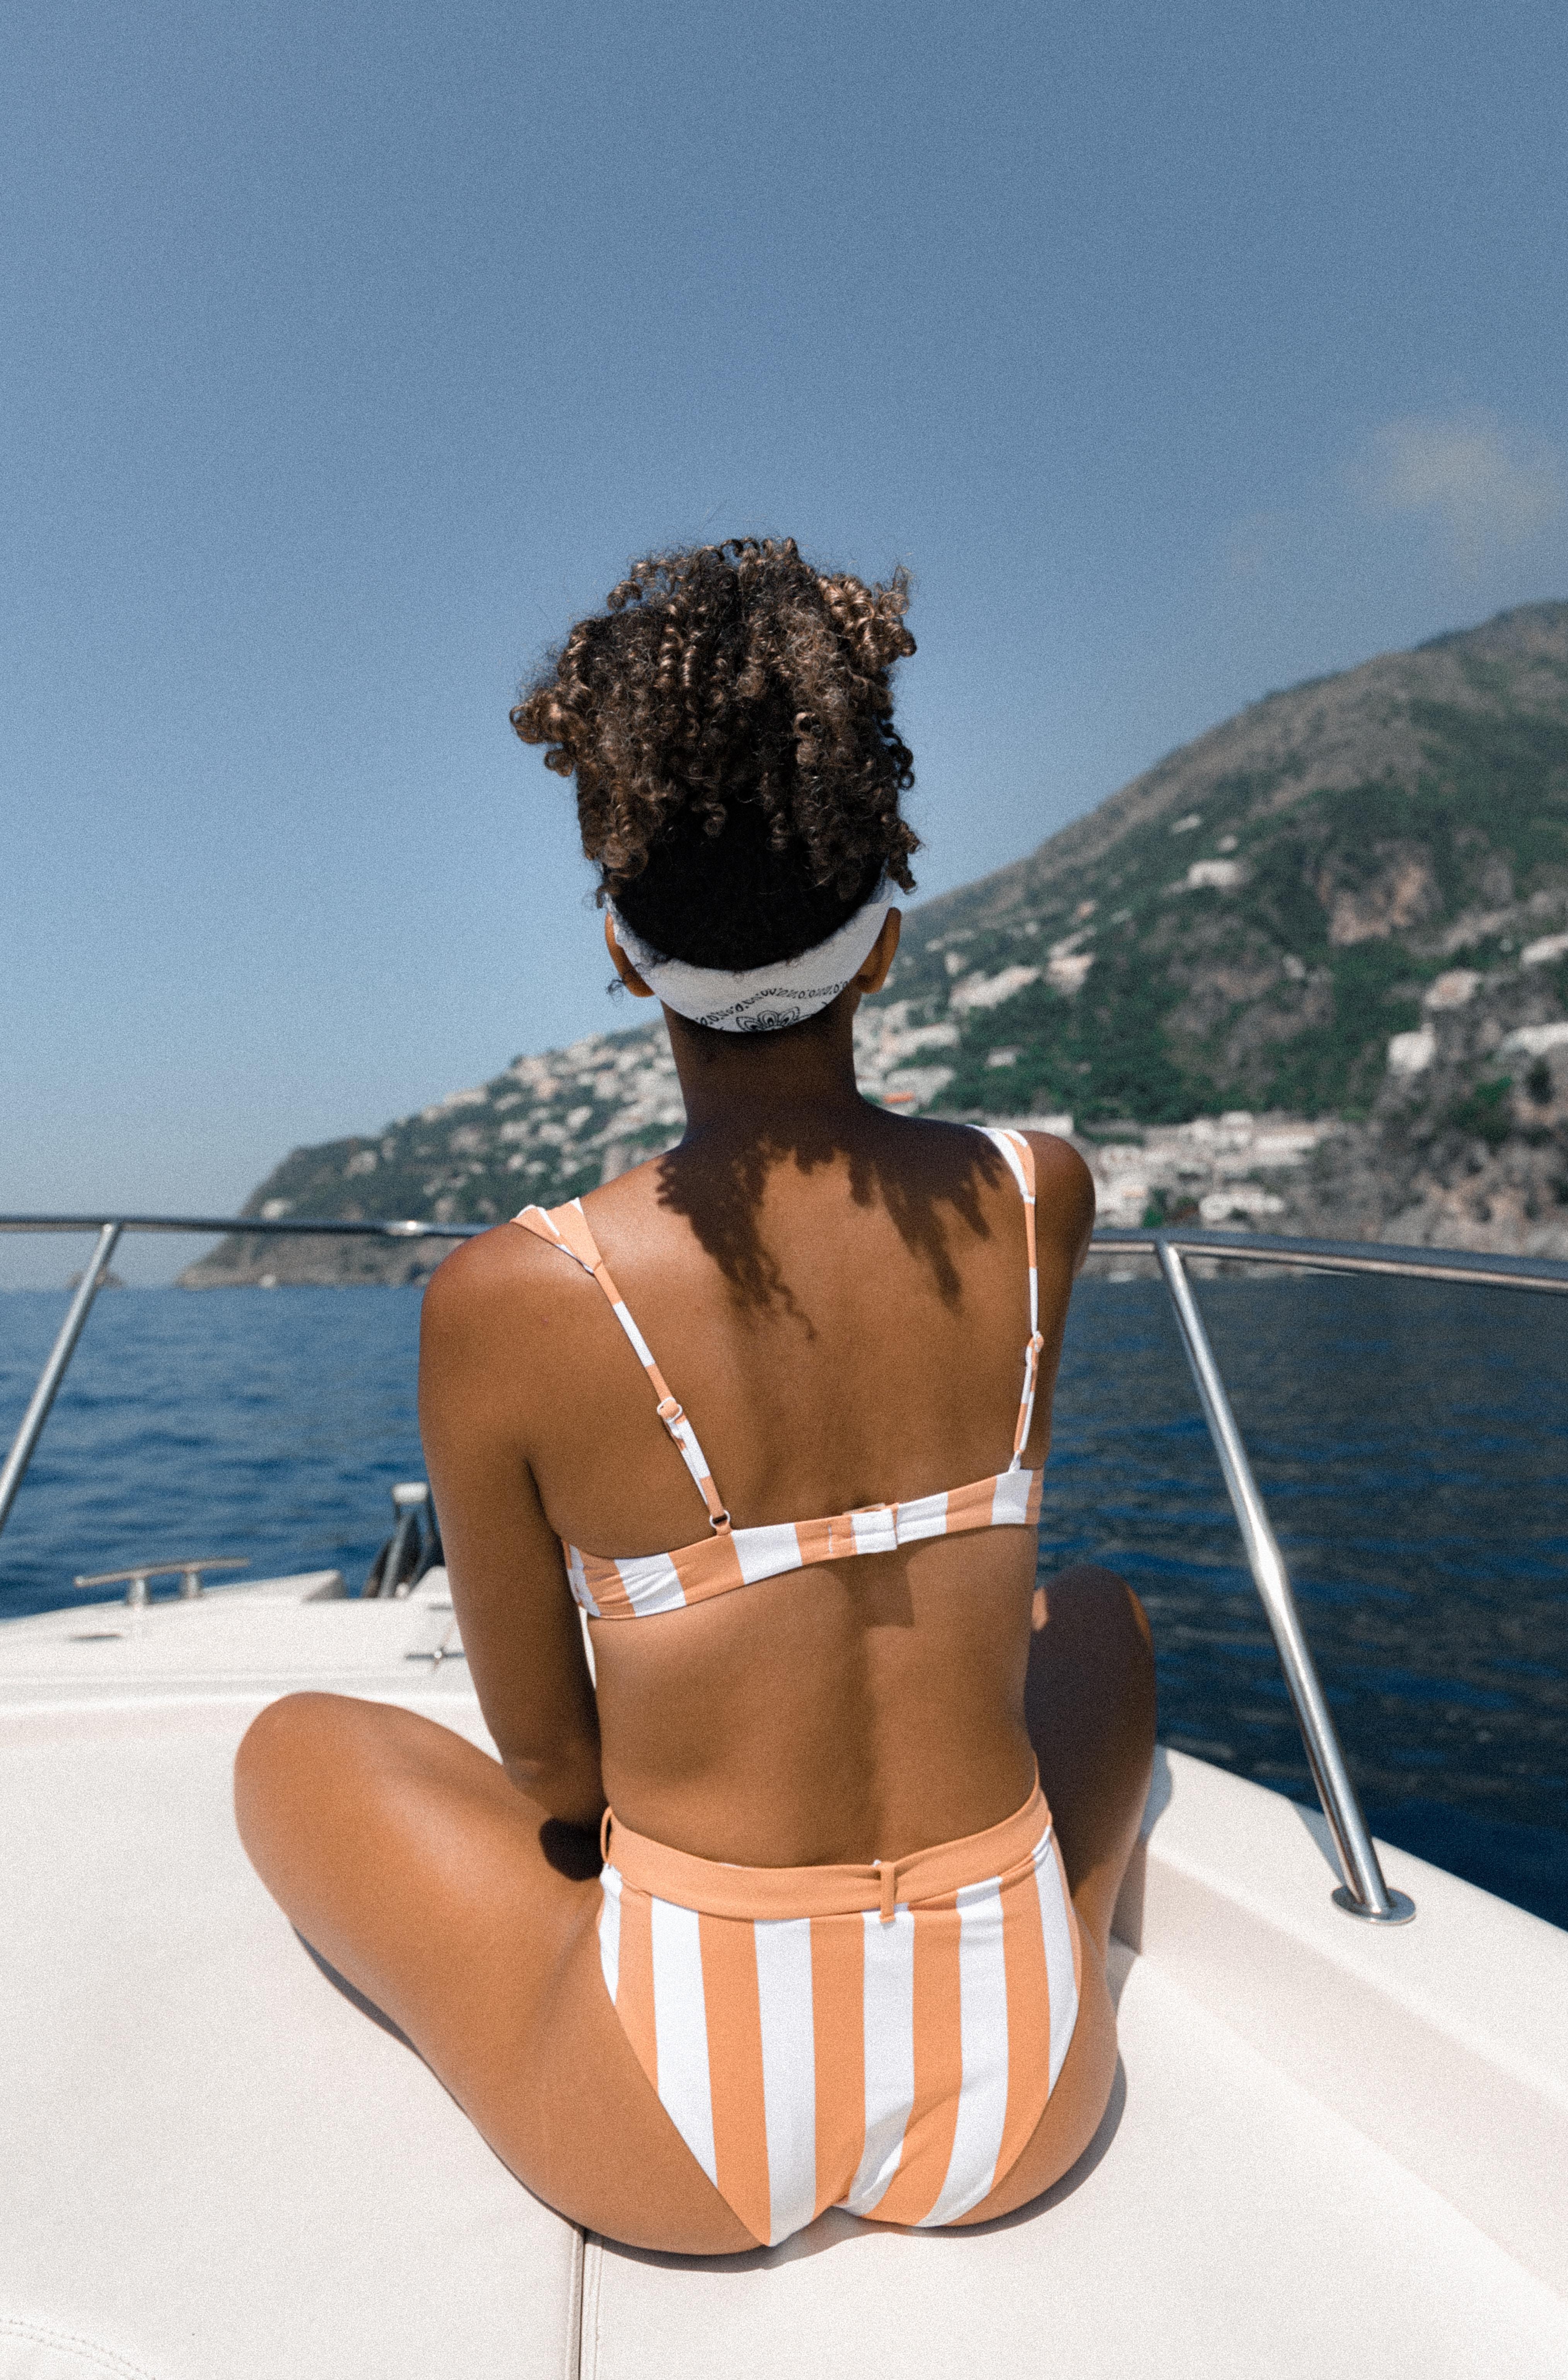 woman wearing white-and-brown bikini set while sitting on boat watching island